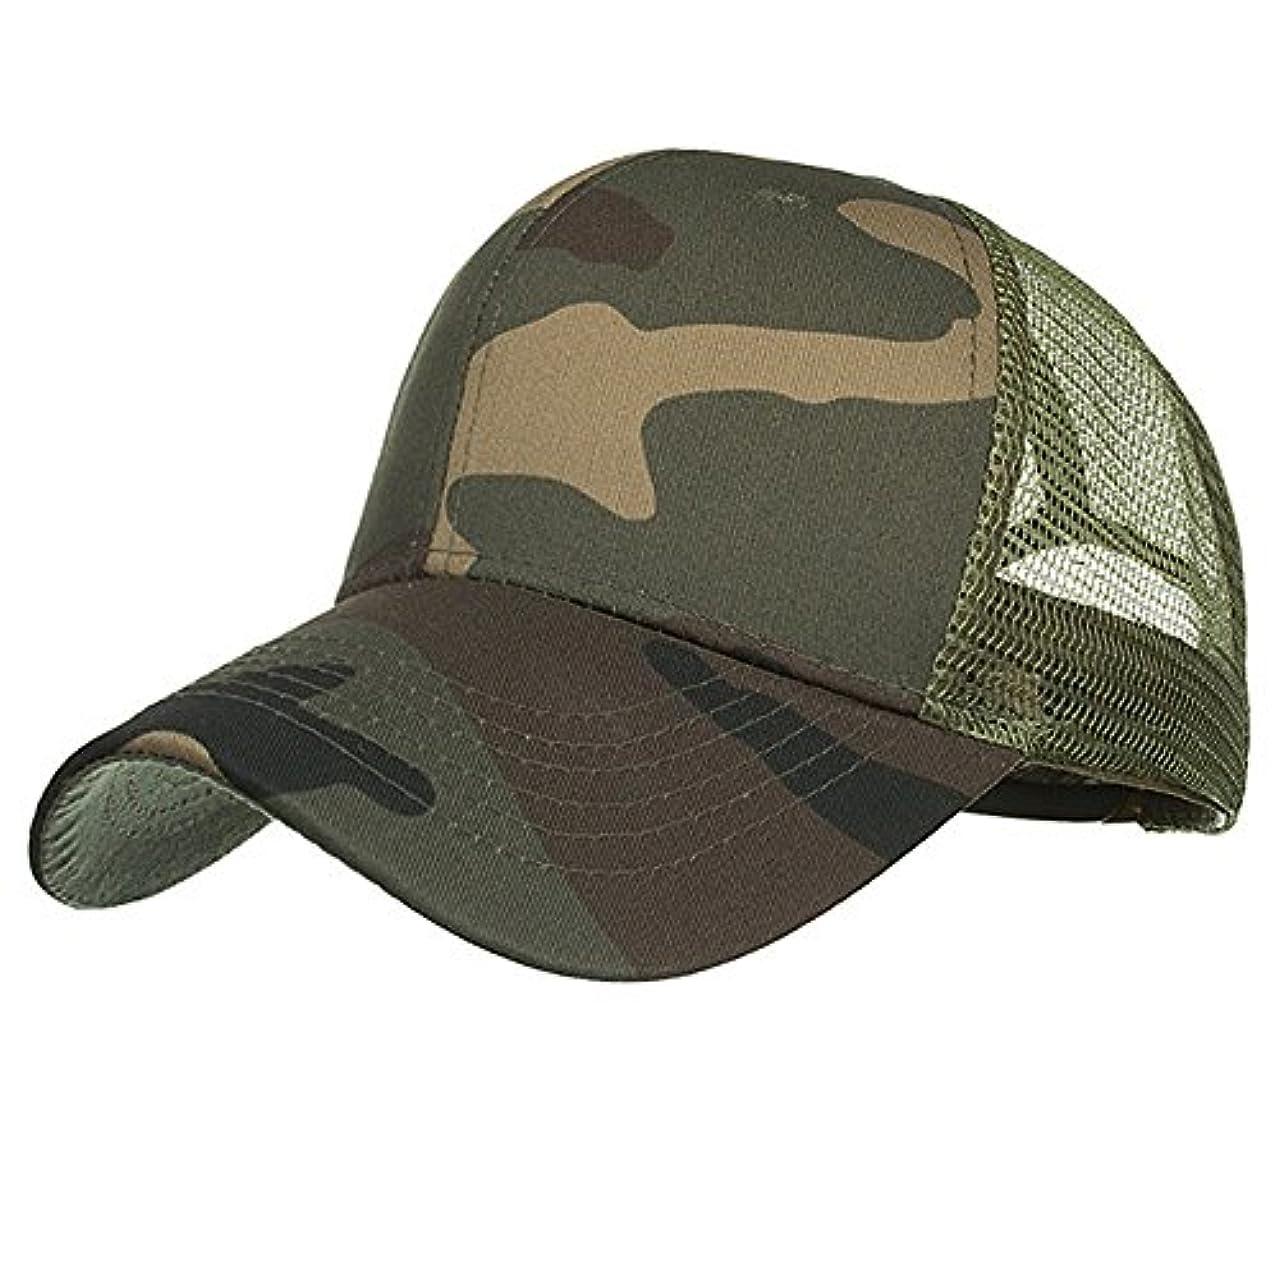 Racazing Cap 迷彩 野球帽 メッシュステッチ 通気性のある 帽子 夏 登山 可調整可能 刺繍 棒球帽 UV 帽子 軽量 屋外 Unisex Hat (A)